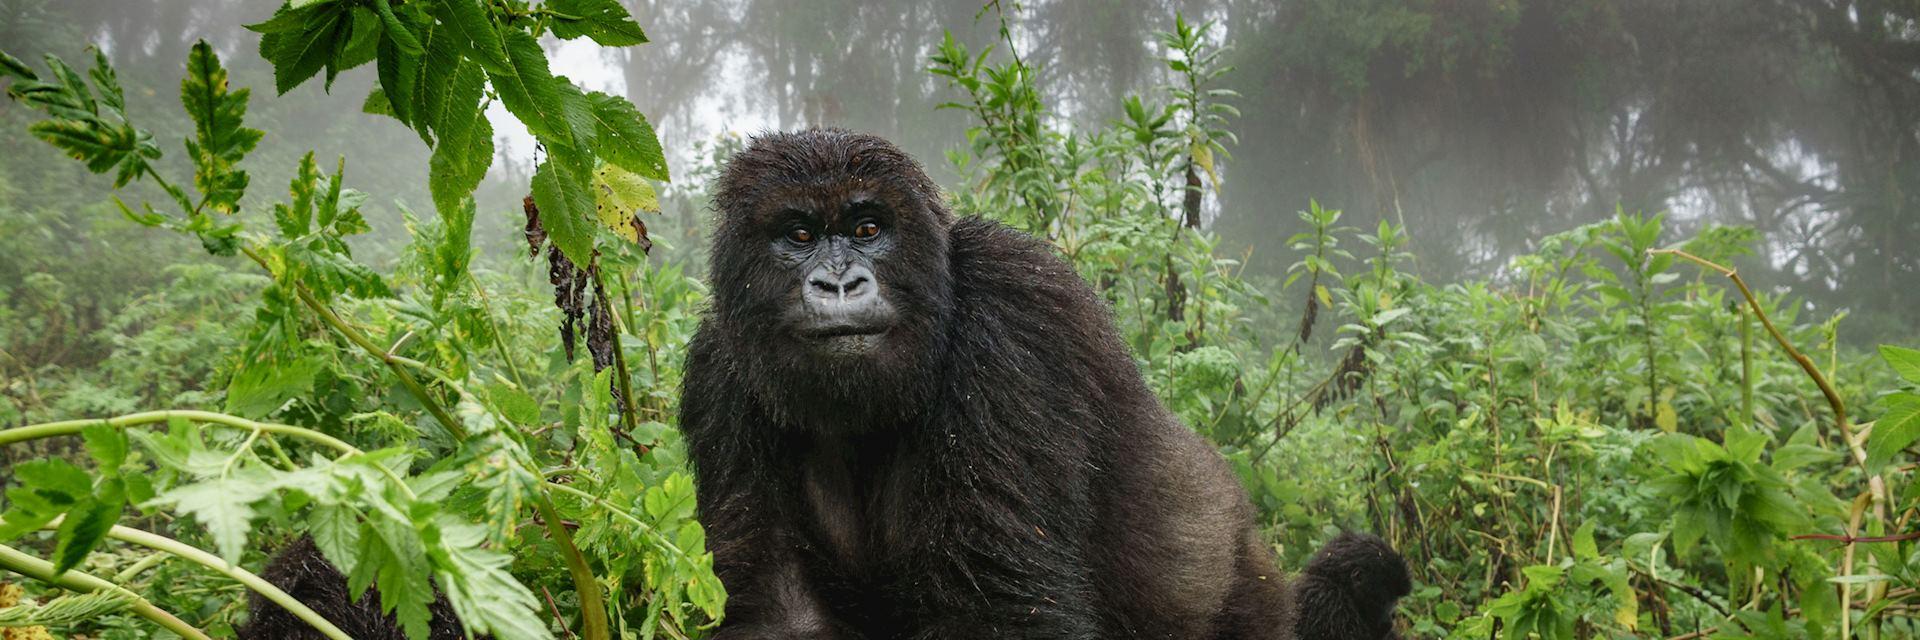 Gorilla in Mgahinga National Park